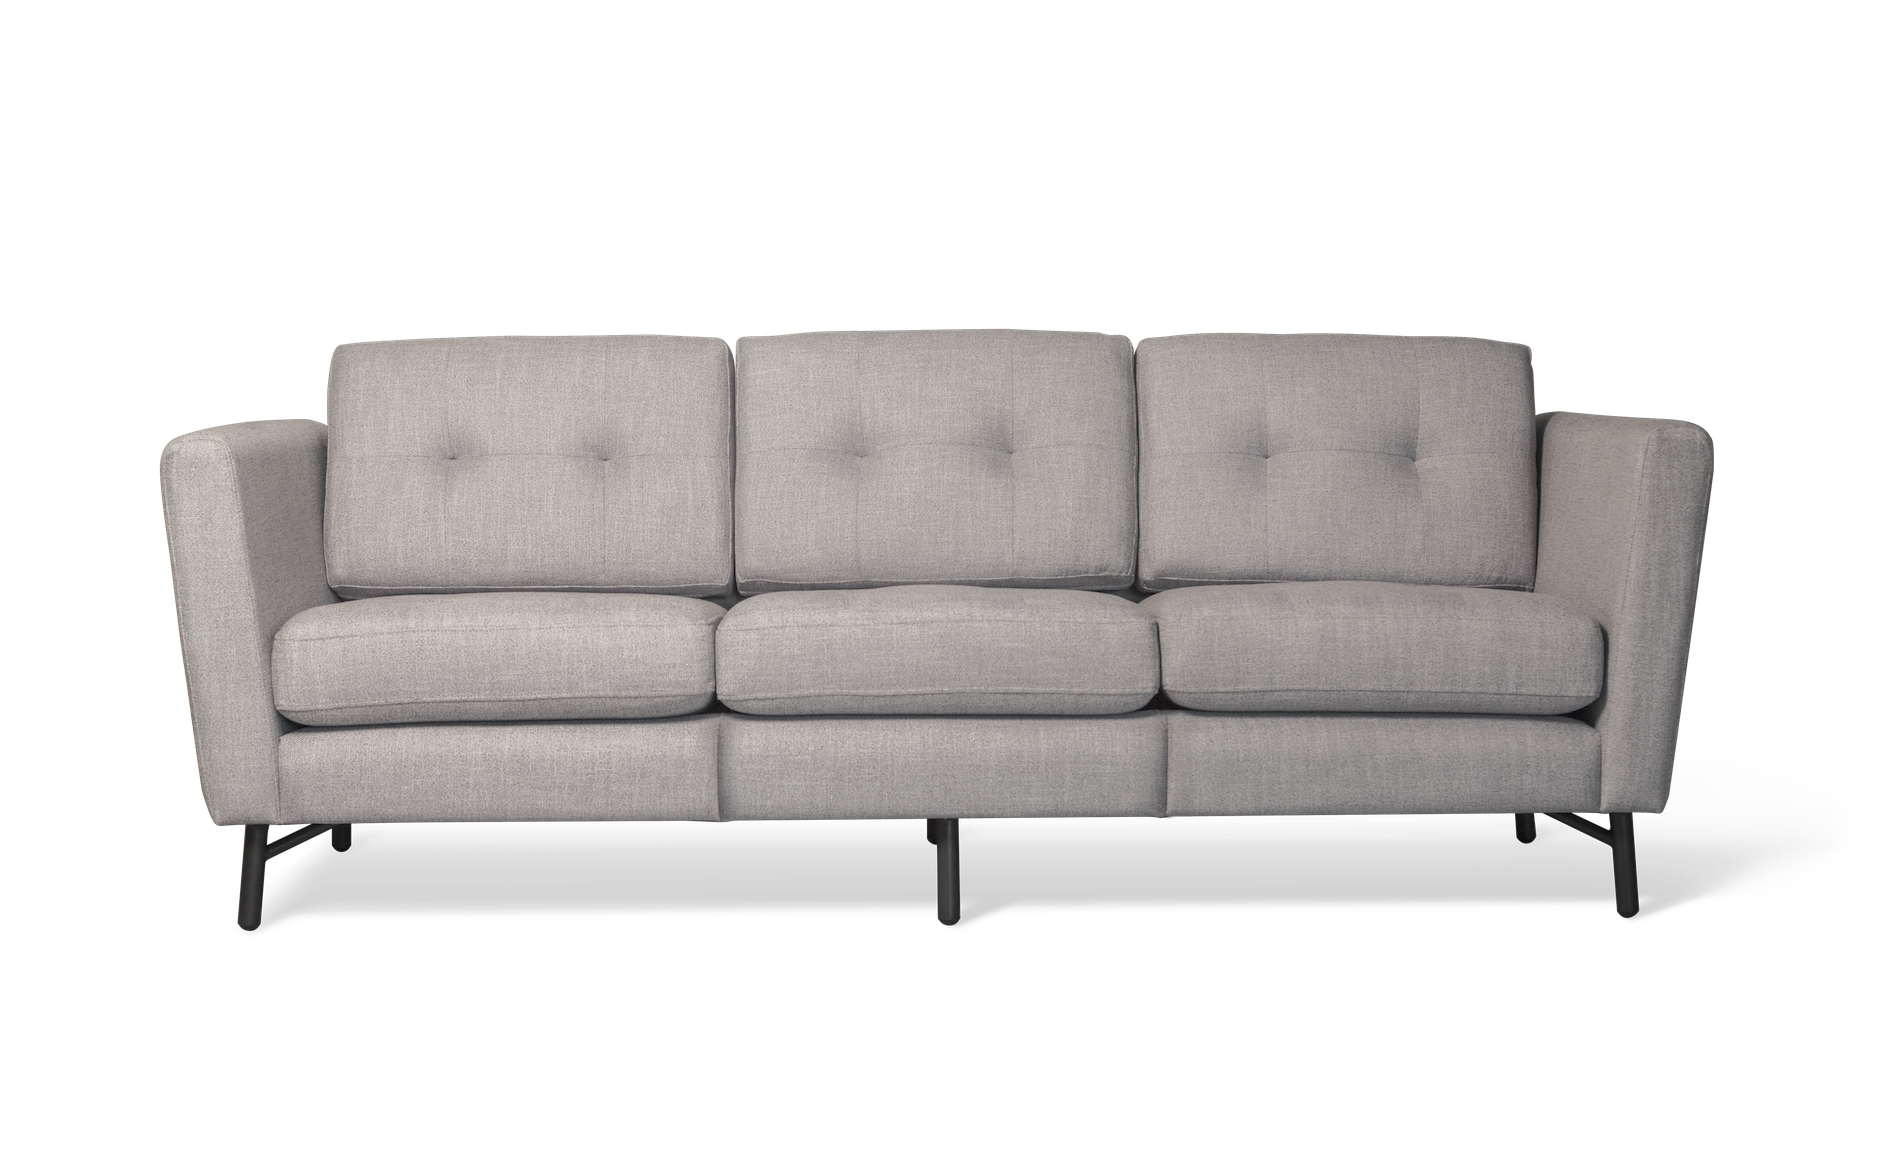 Burrow Sectional Sofa Cheap Sofa Beds Small Sectional Sofa